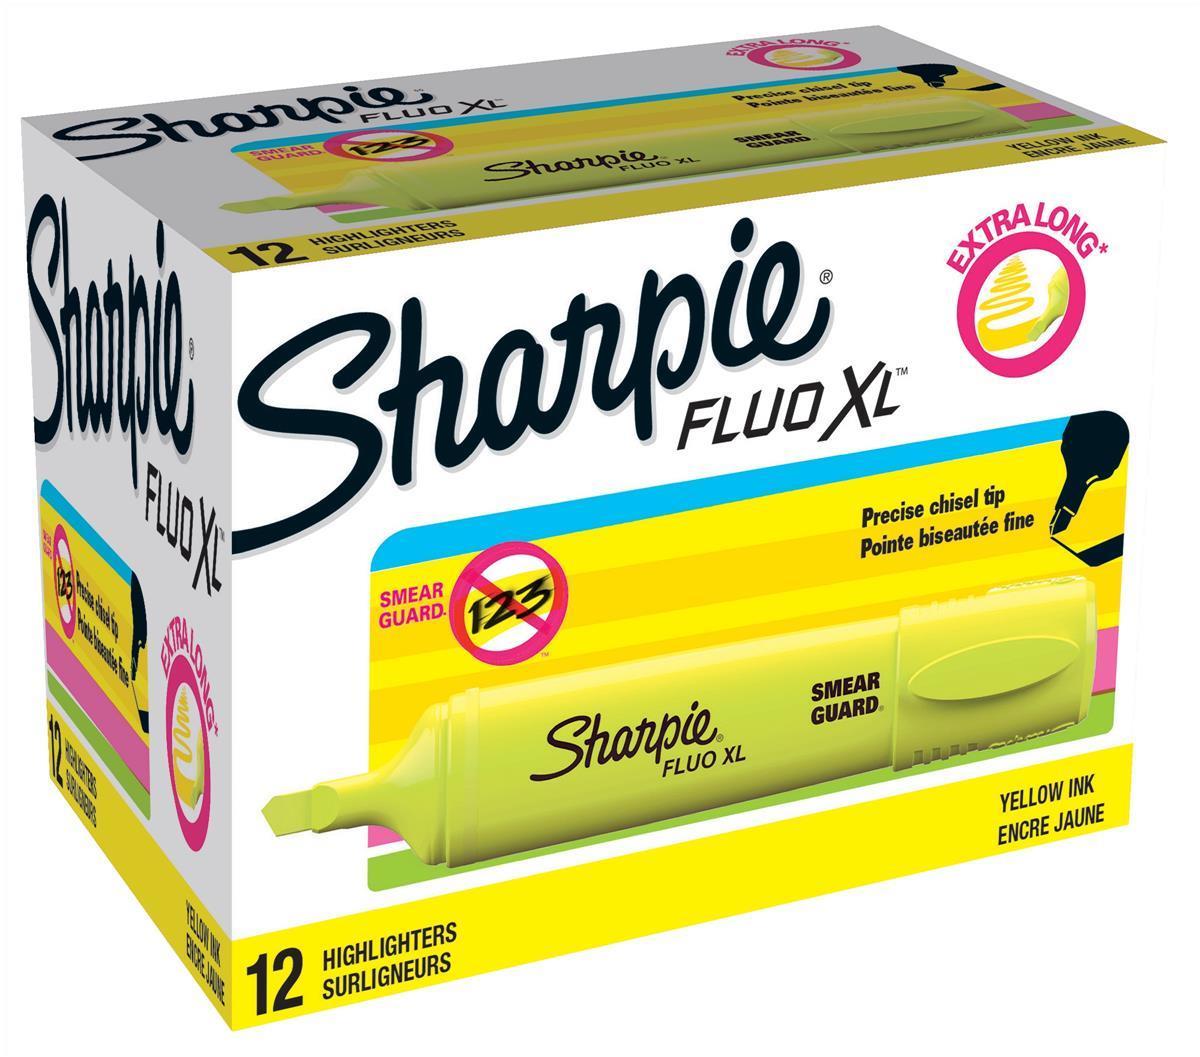 Sharpie Fluo XL Highlighter Chisel Tip 3 Widths Yellow Ref 1825634 [Pack 12]